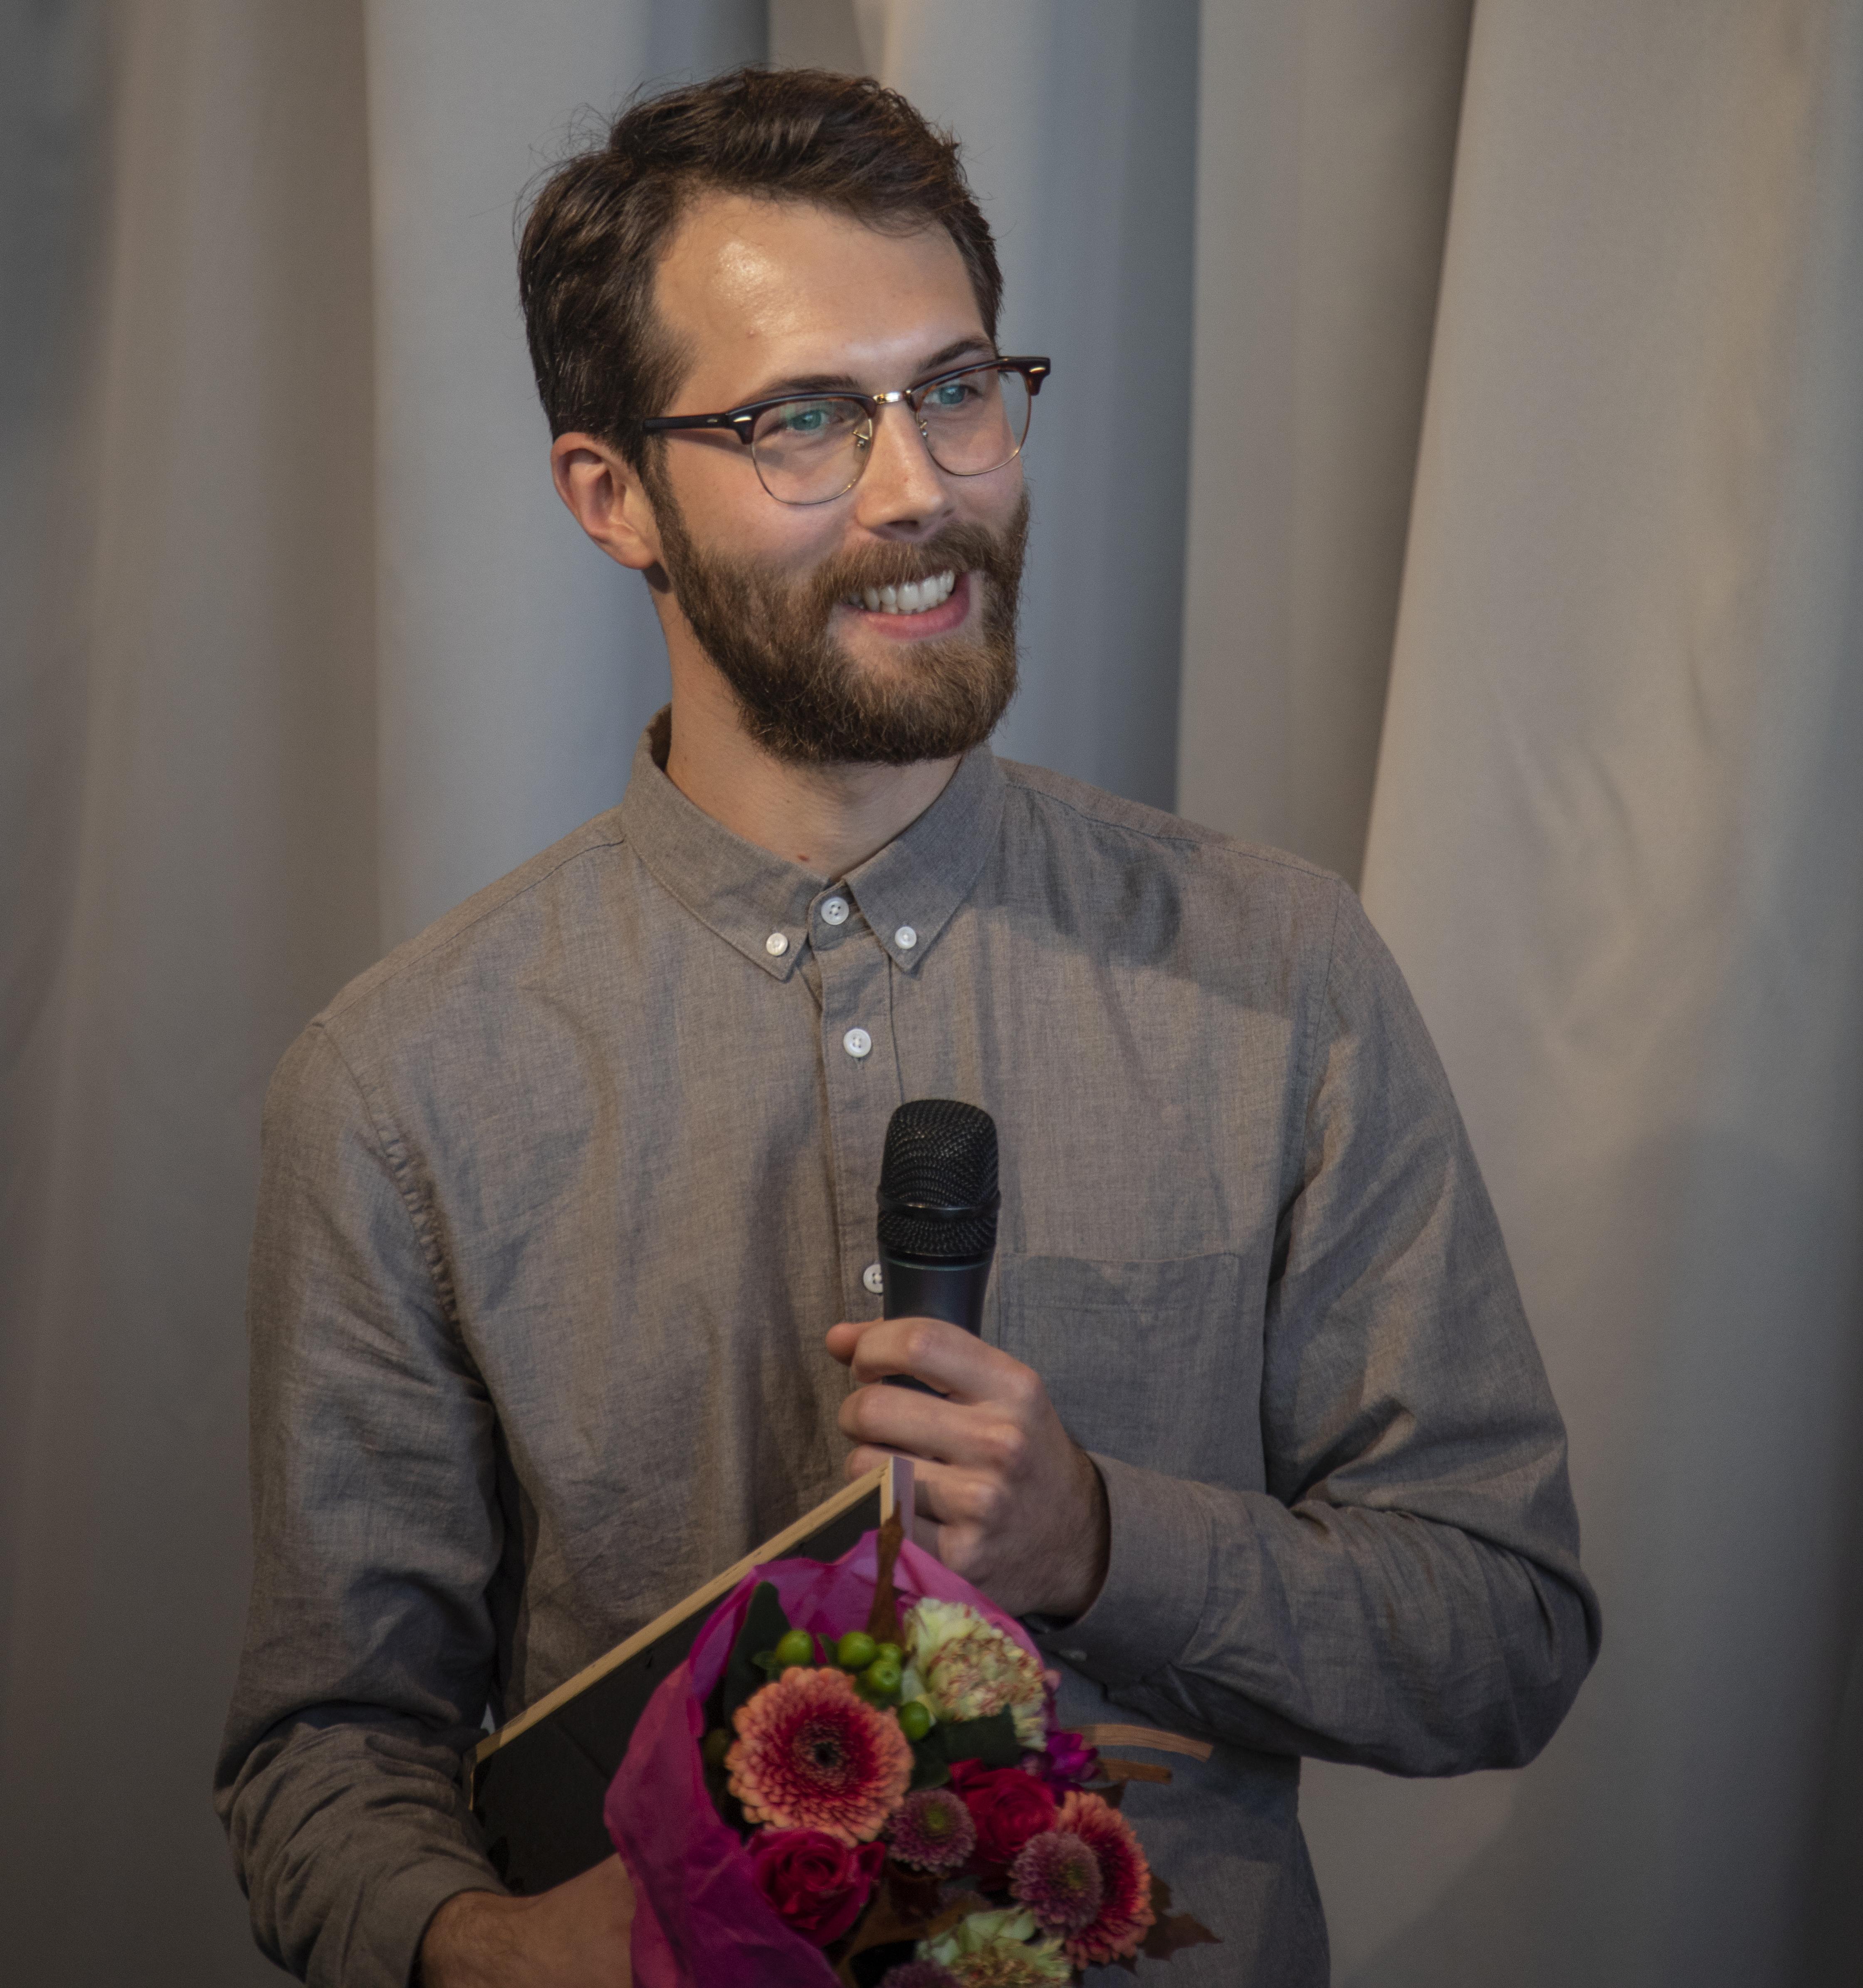 Magnus Annemark